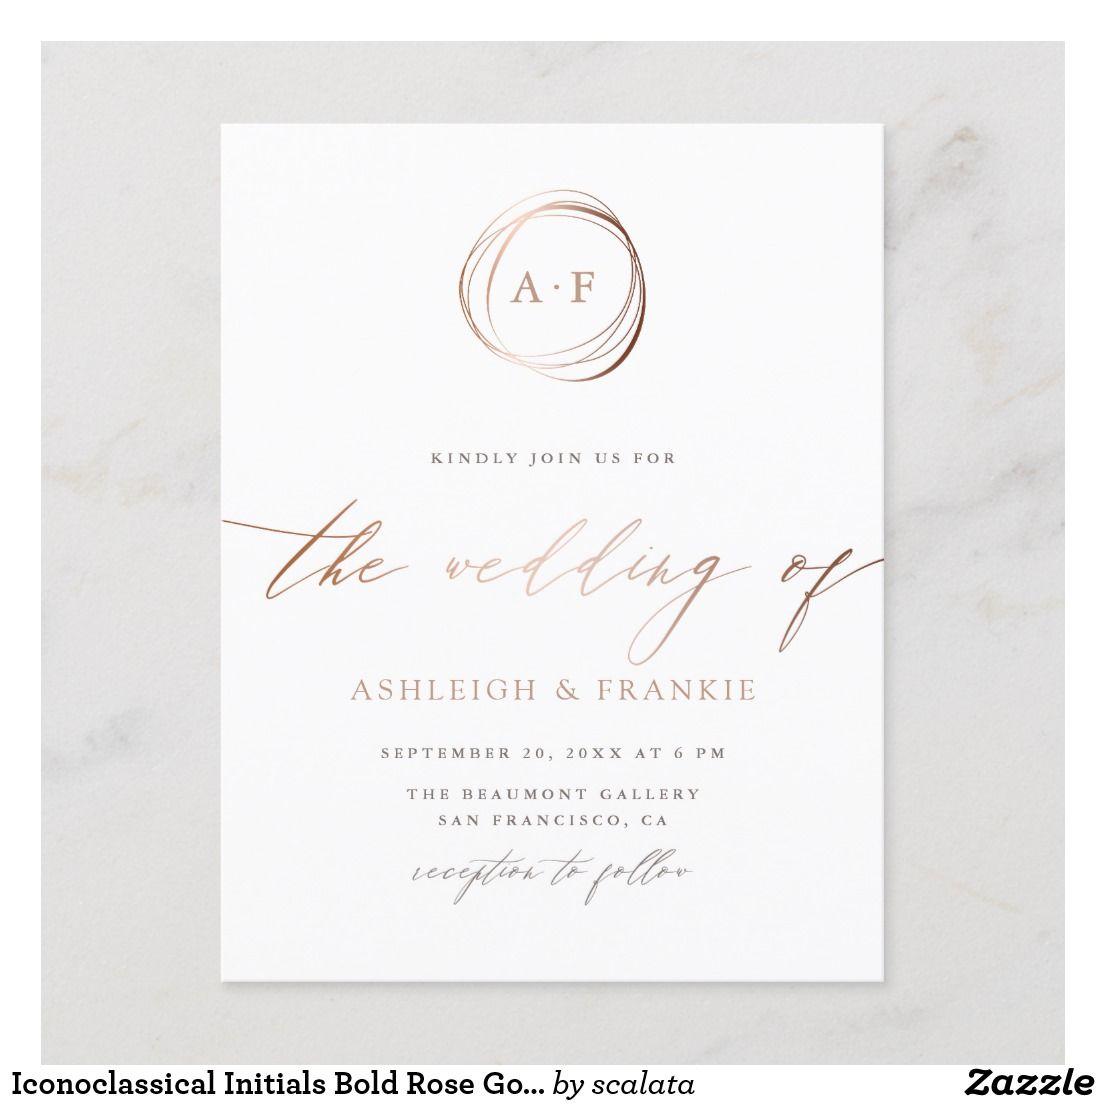 Iconoclassical Initials Bold Rose Gold Wedding Invitation Postcard Zazzle Com Rose Gold Wedding Invitations Postcard Wedding Invitation Wedding Invitations